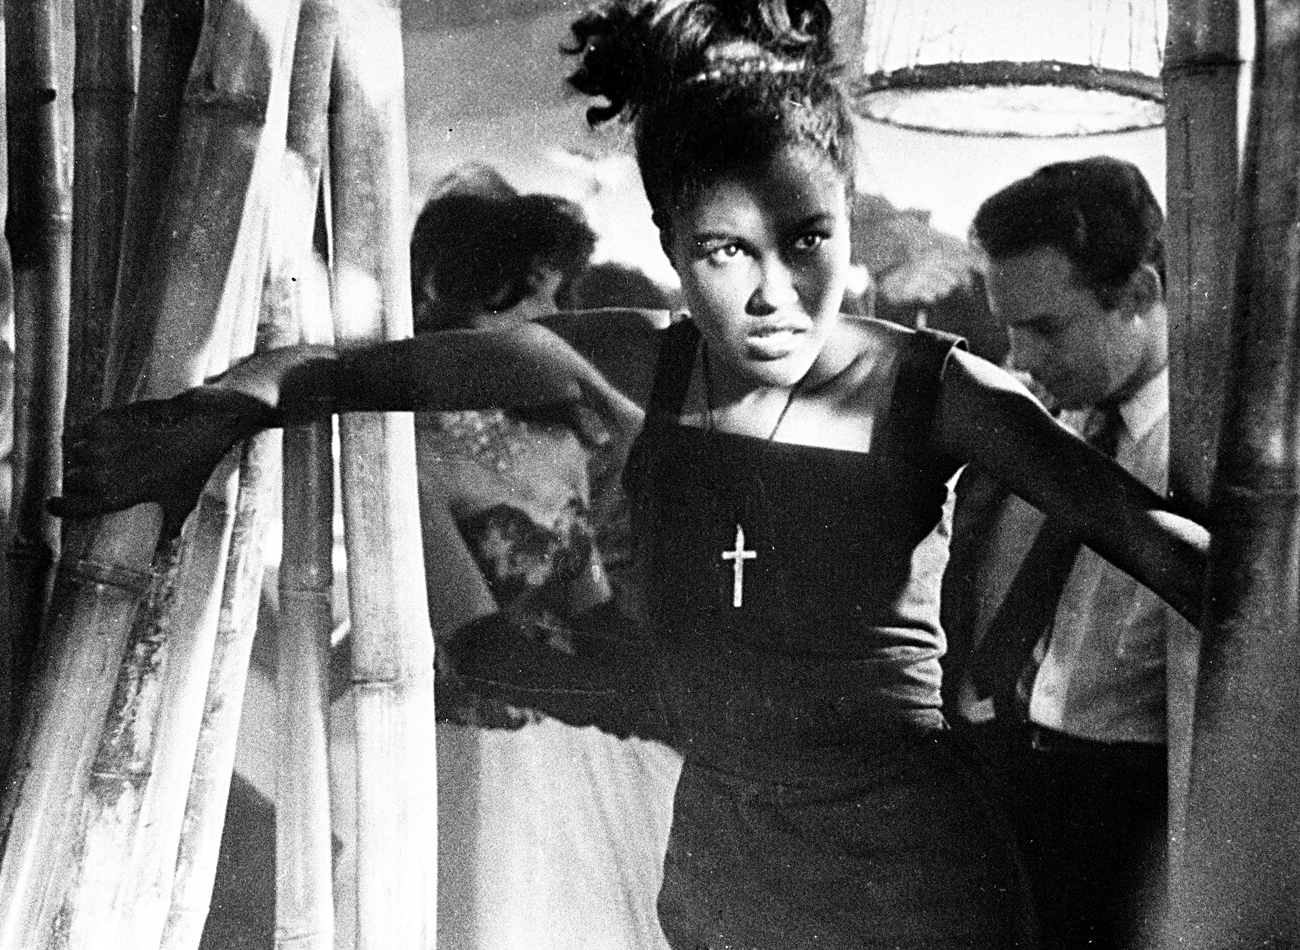 Reproduction of a scene from Mikhail Kalatozov's movie, based on Yevtushenko's prose-poem. Mosfilm and ICAIC (Cuba) Studios, 1964. / Source: RIA Novosti